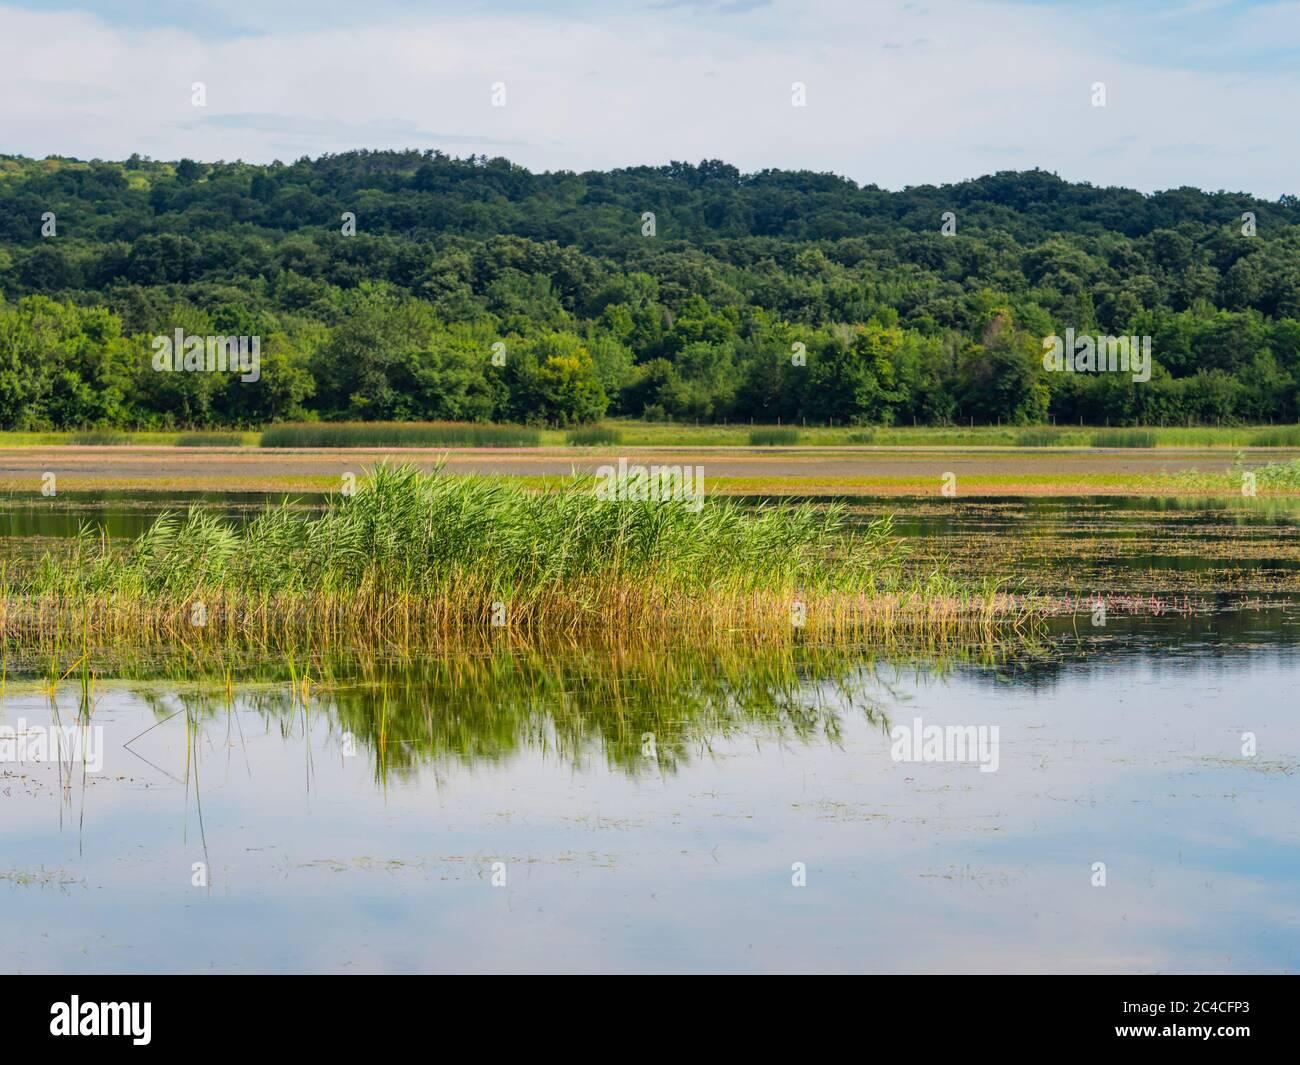 Swampy lake mirror image mirroring Ponikve island Krk Croatia Europe Stock Photo